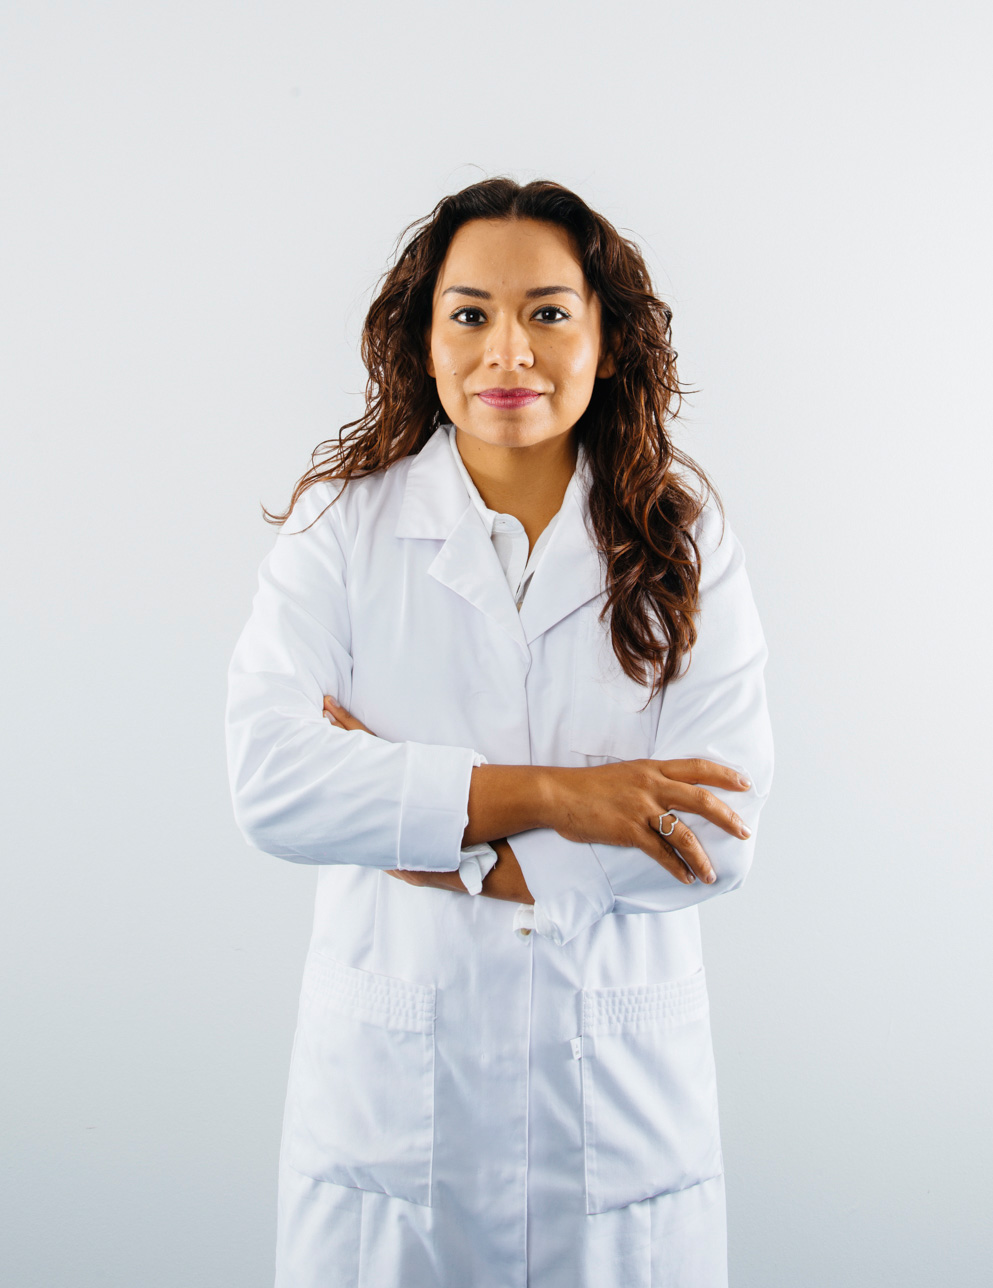 Nancy Villanueva